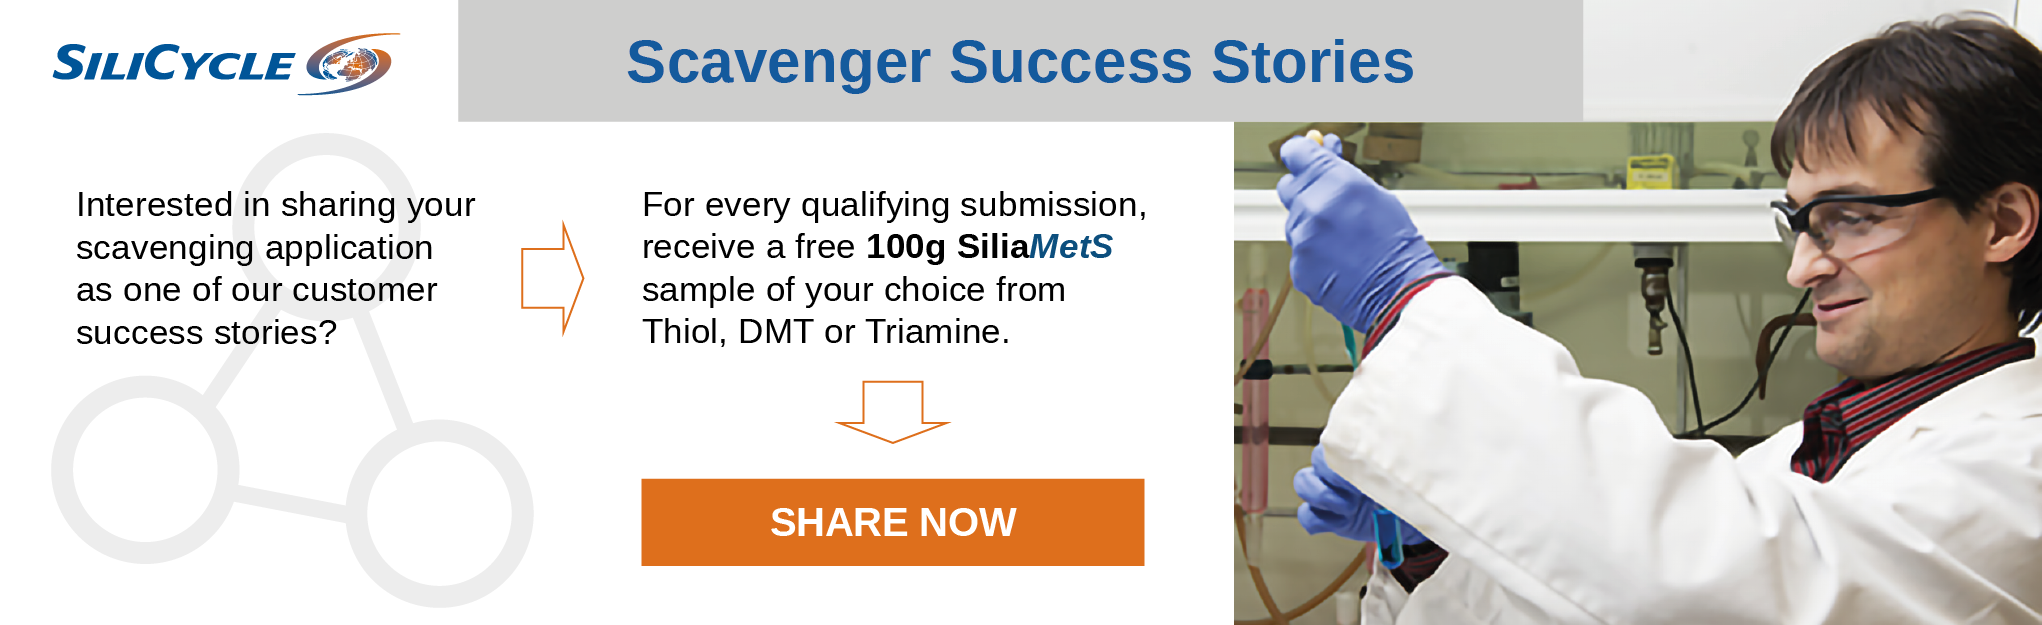 Scavenger Success Story